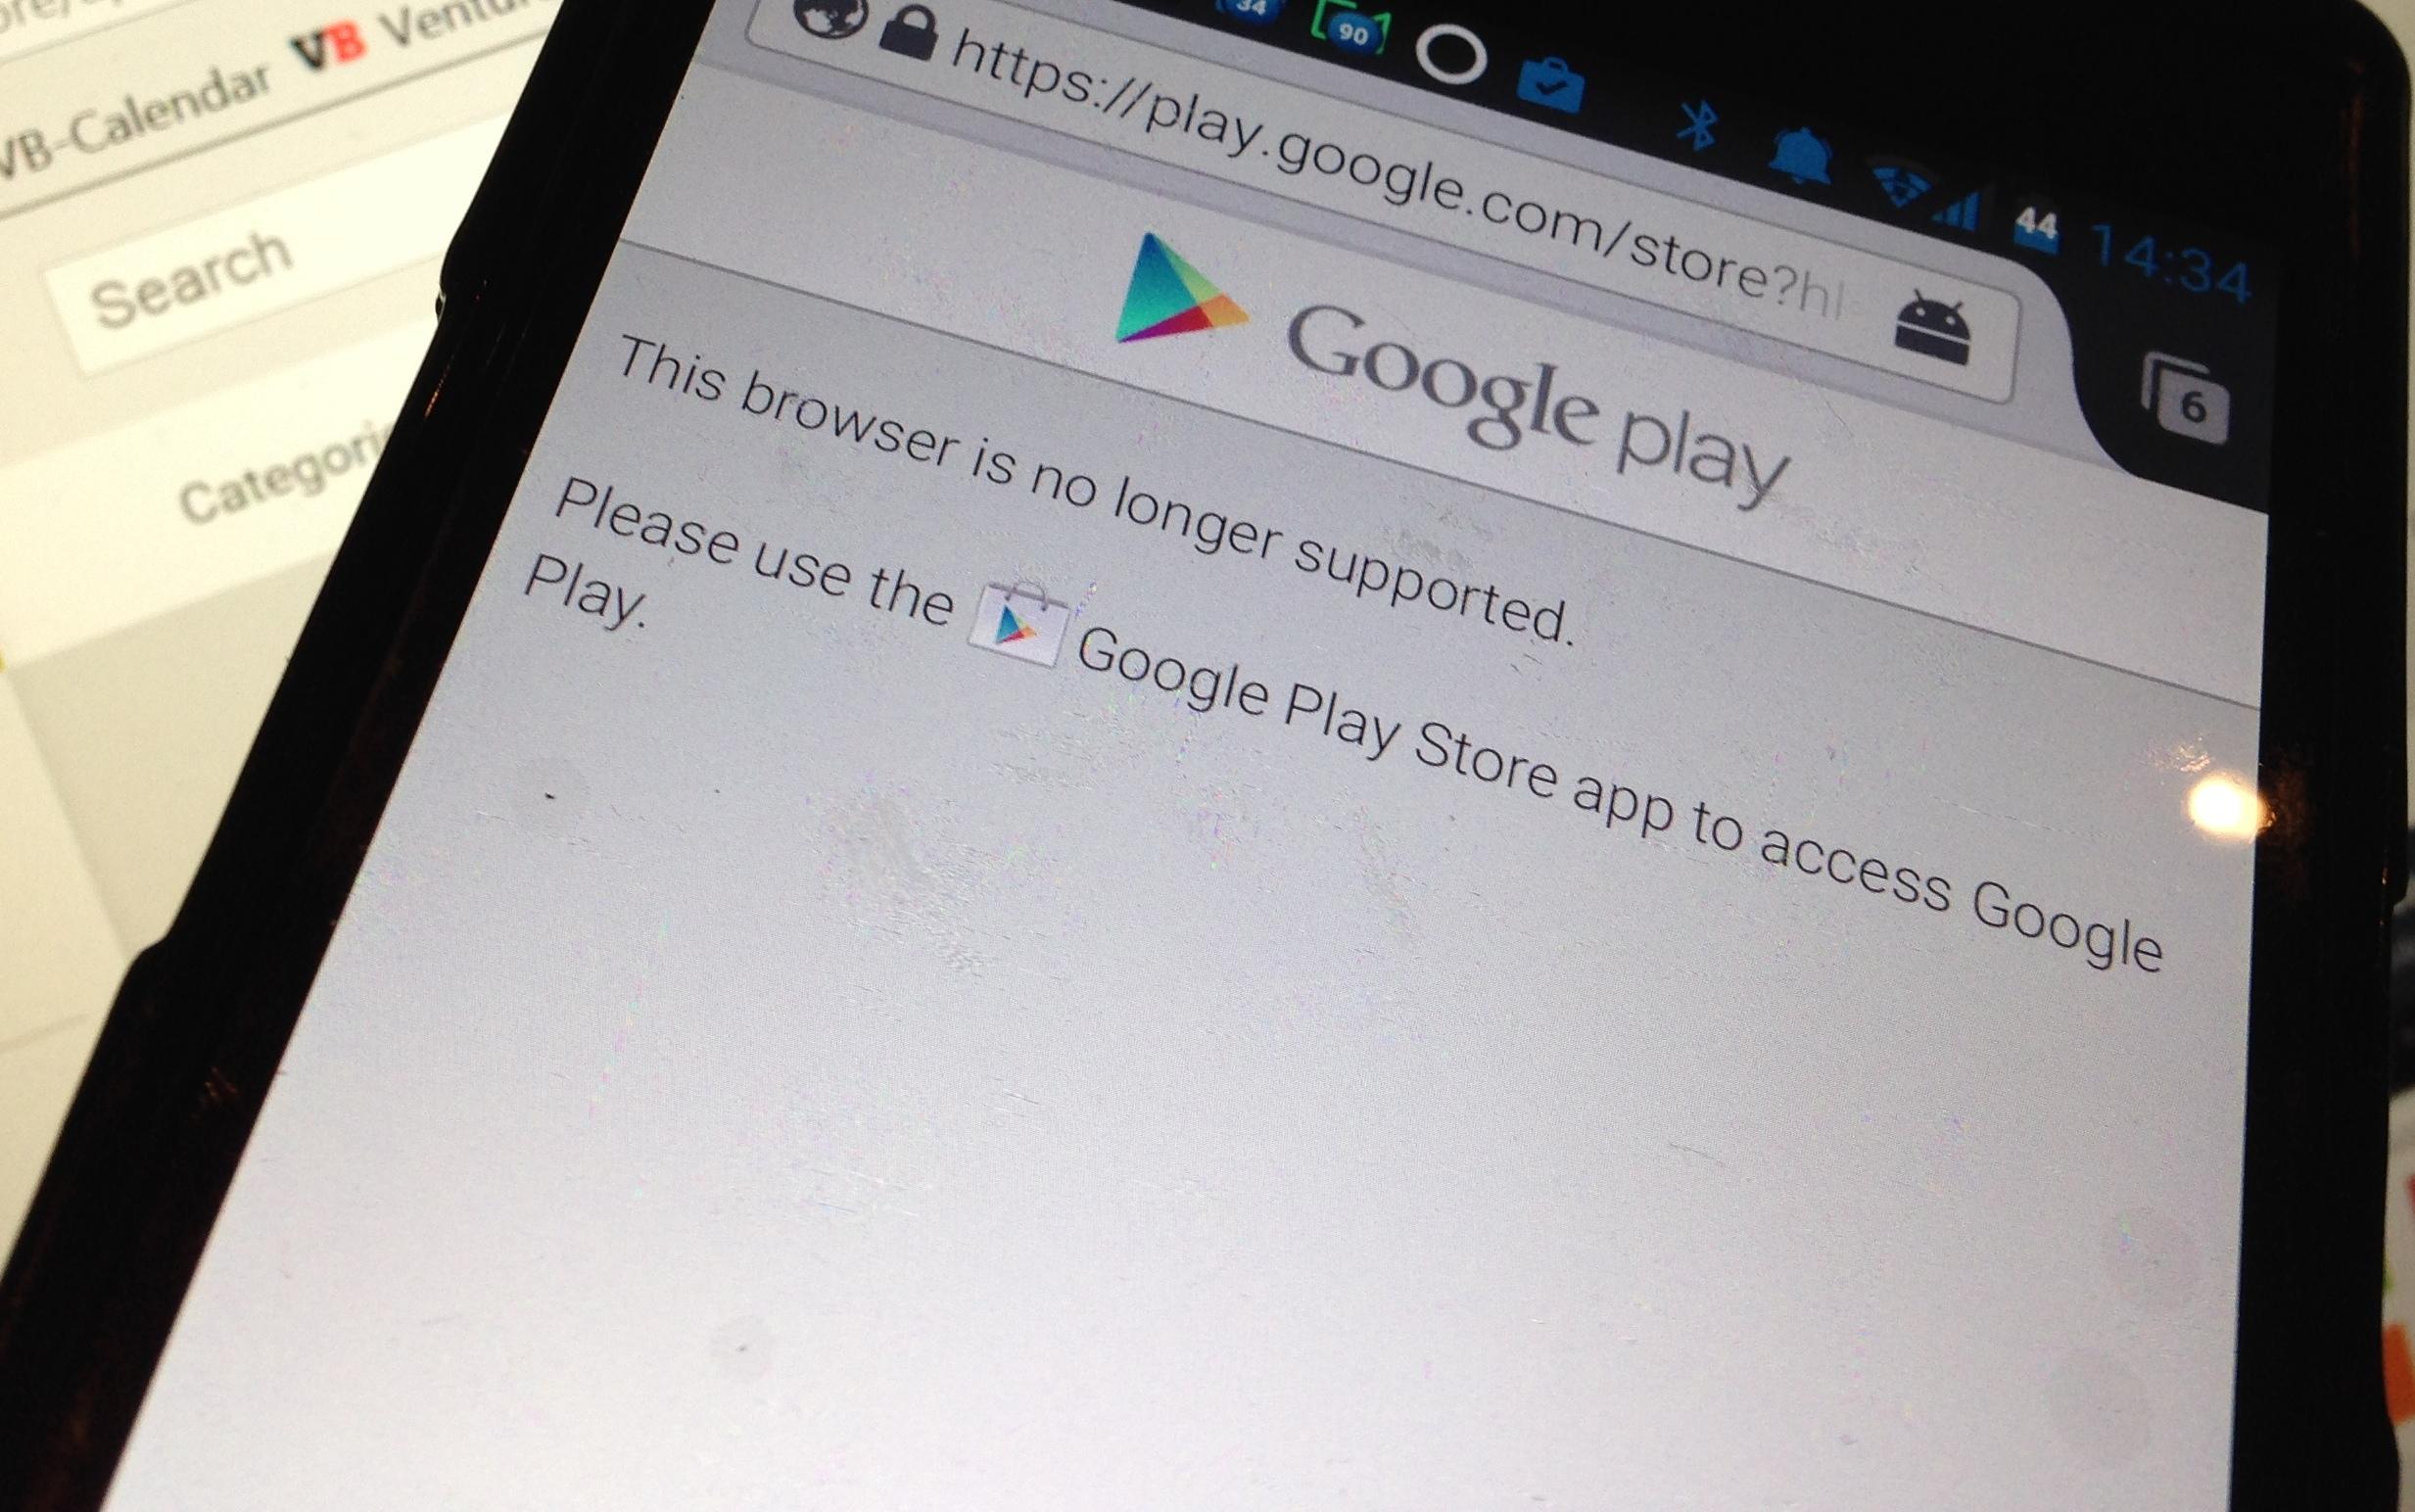 Google Play Firefox